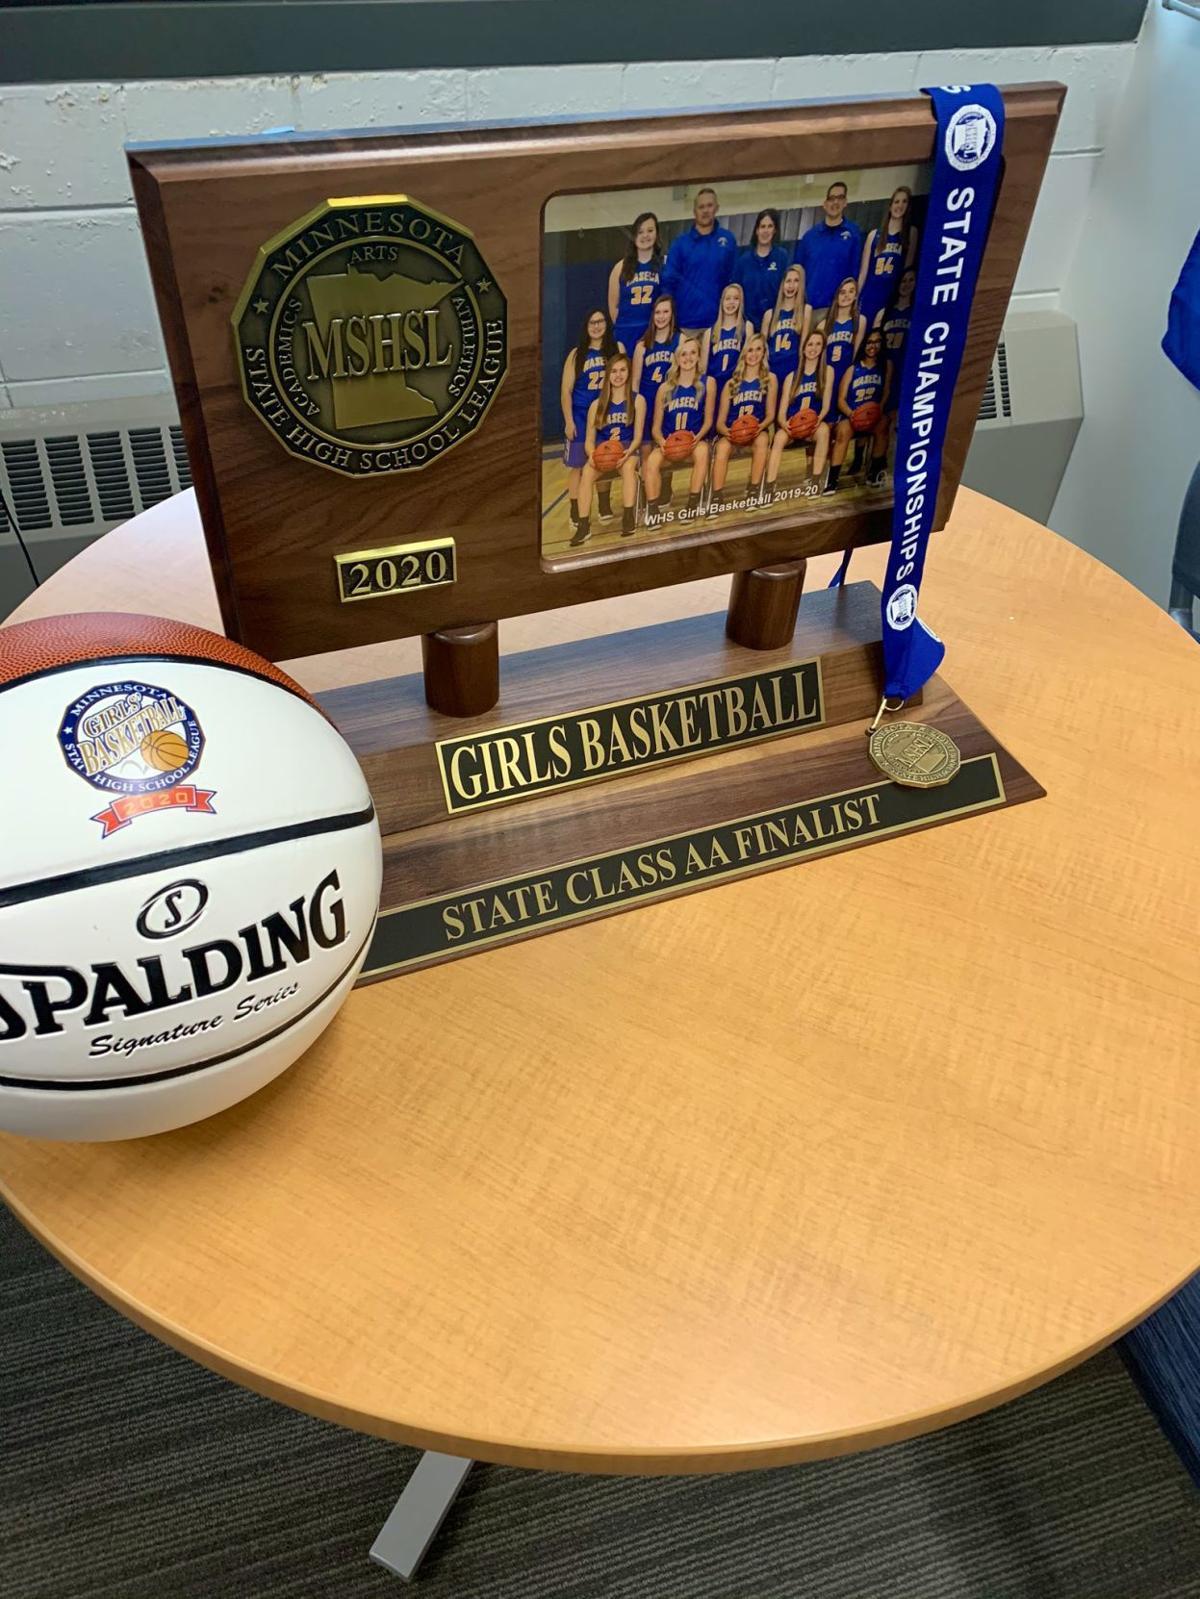 Girls basketball trophy